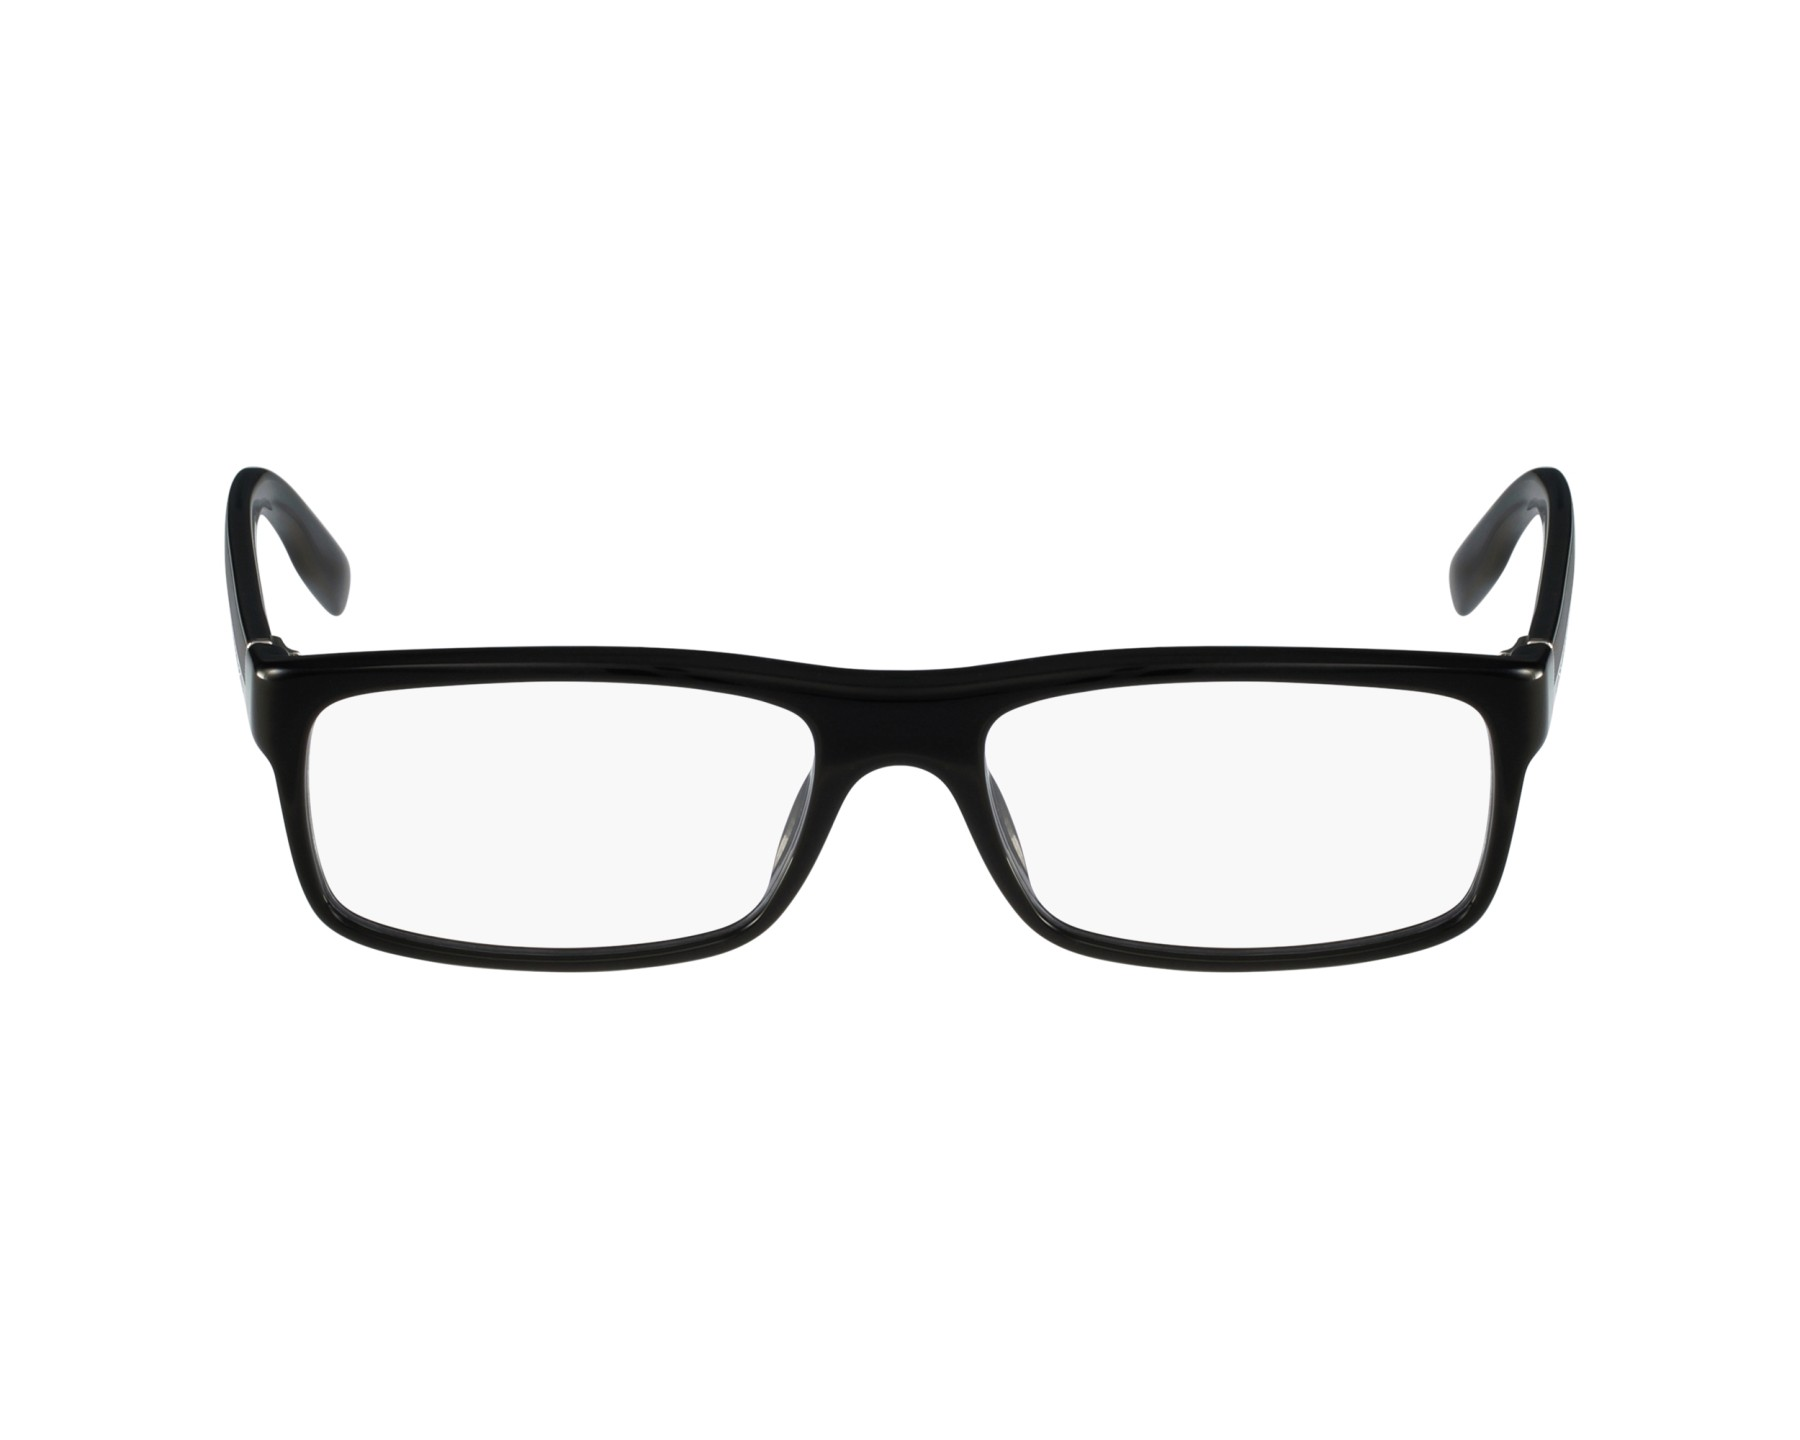 1a2a2d6273233 eyeglasses Hugo Boss BOSS-0523 807 - Black profile view